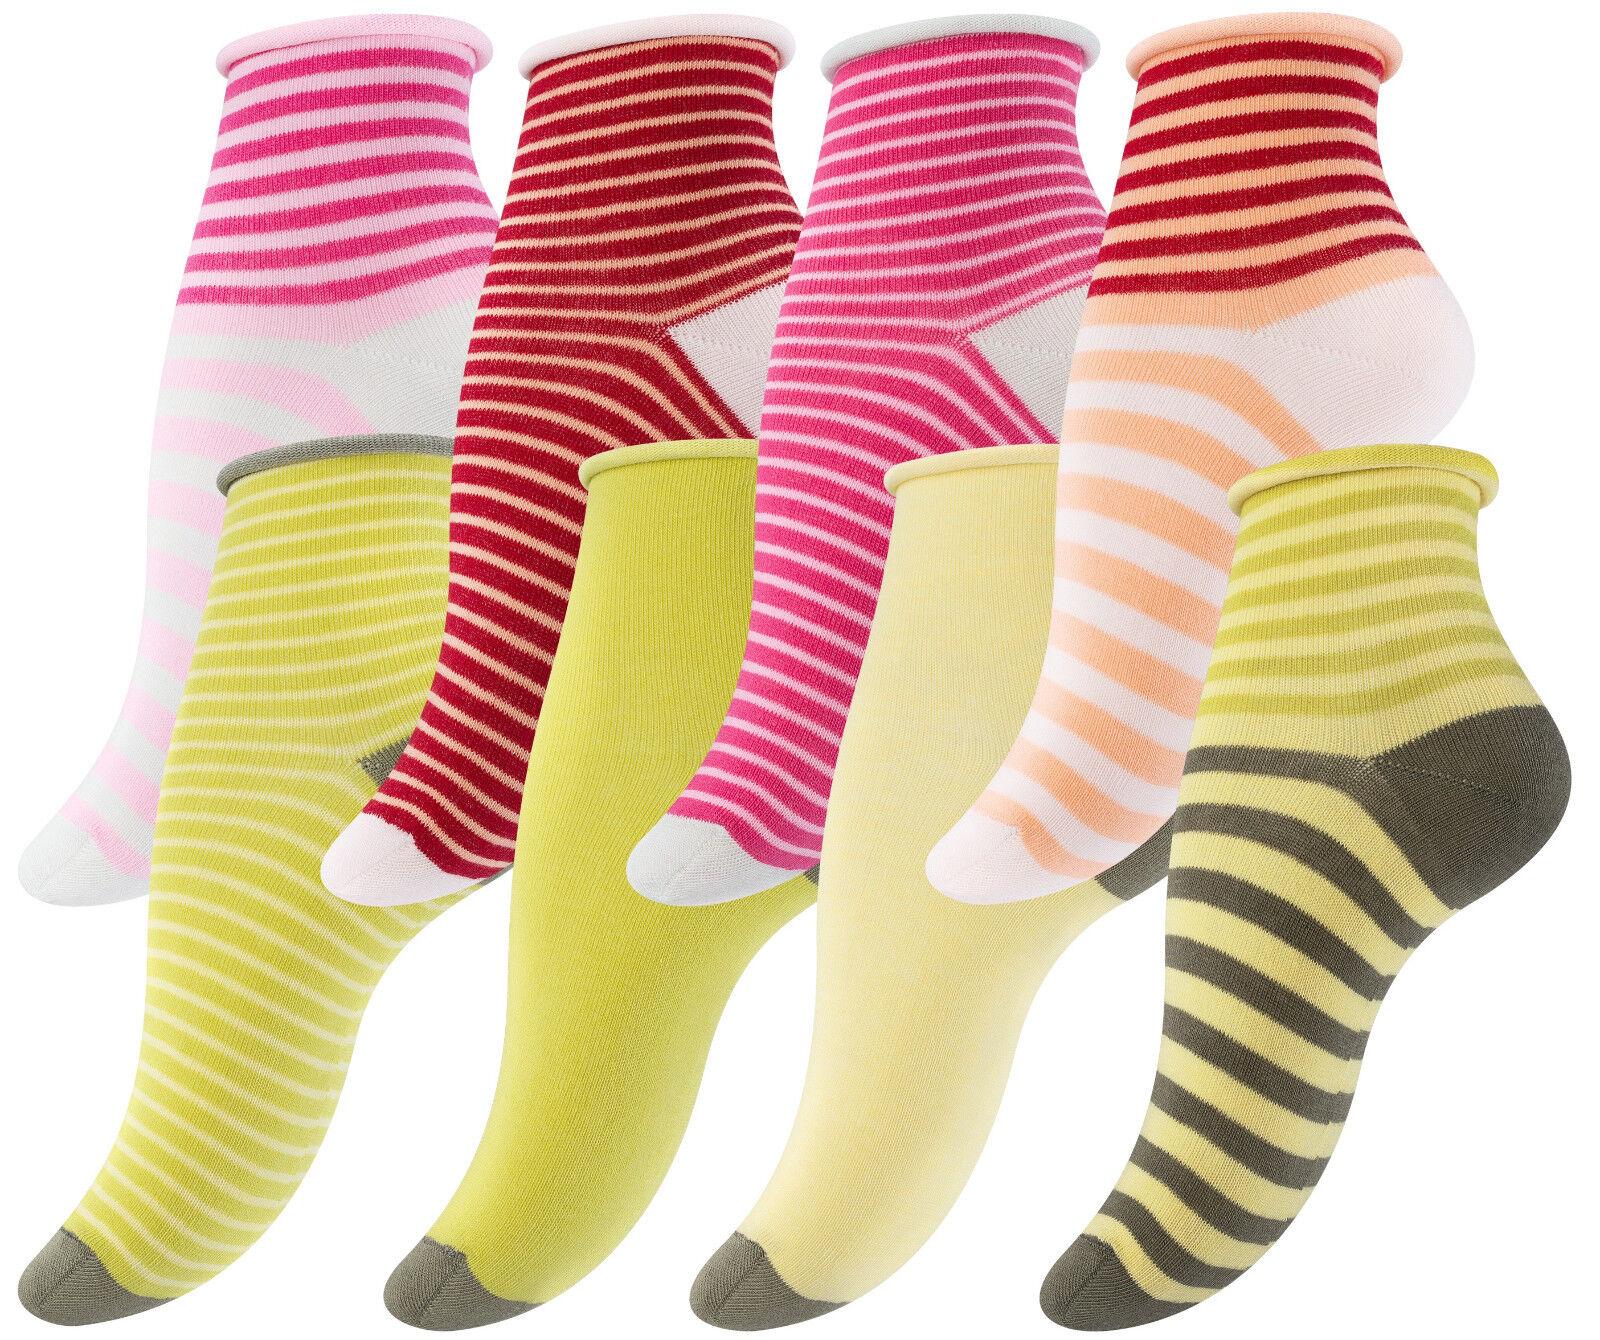 8-12 Paar Damen Socken Kurzsocken Bunte Ringelstrümpfe mit Rollrand ohne Gummi